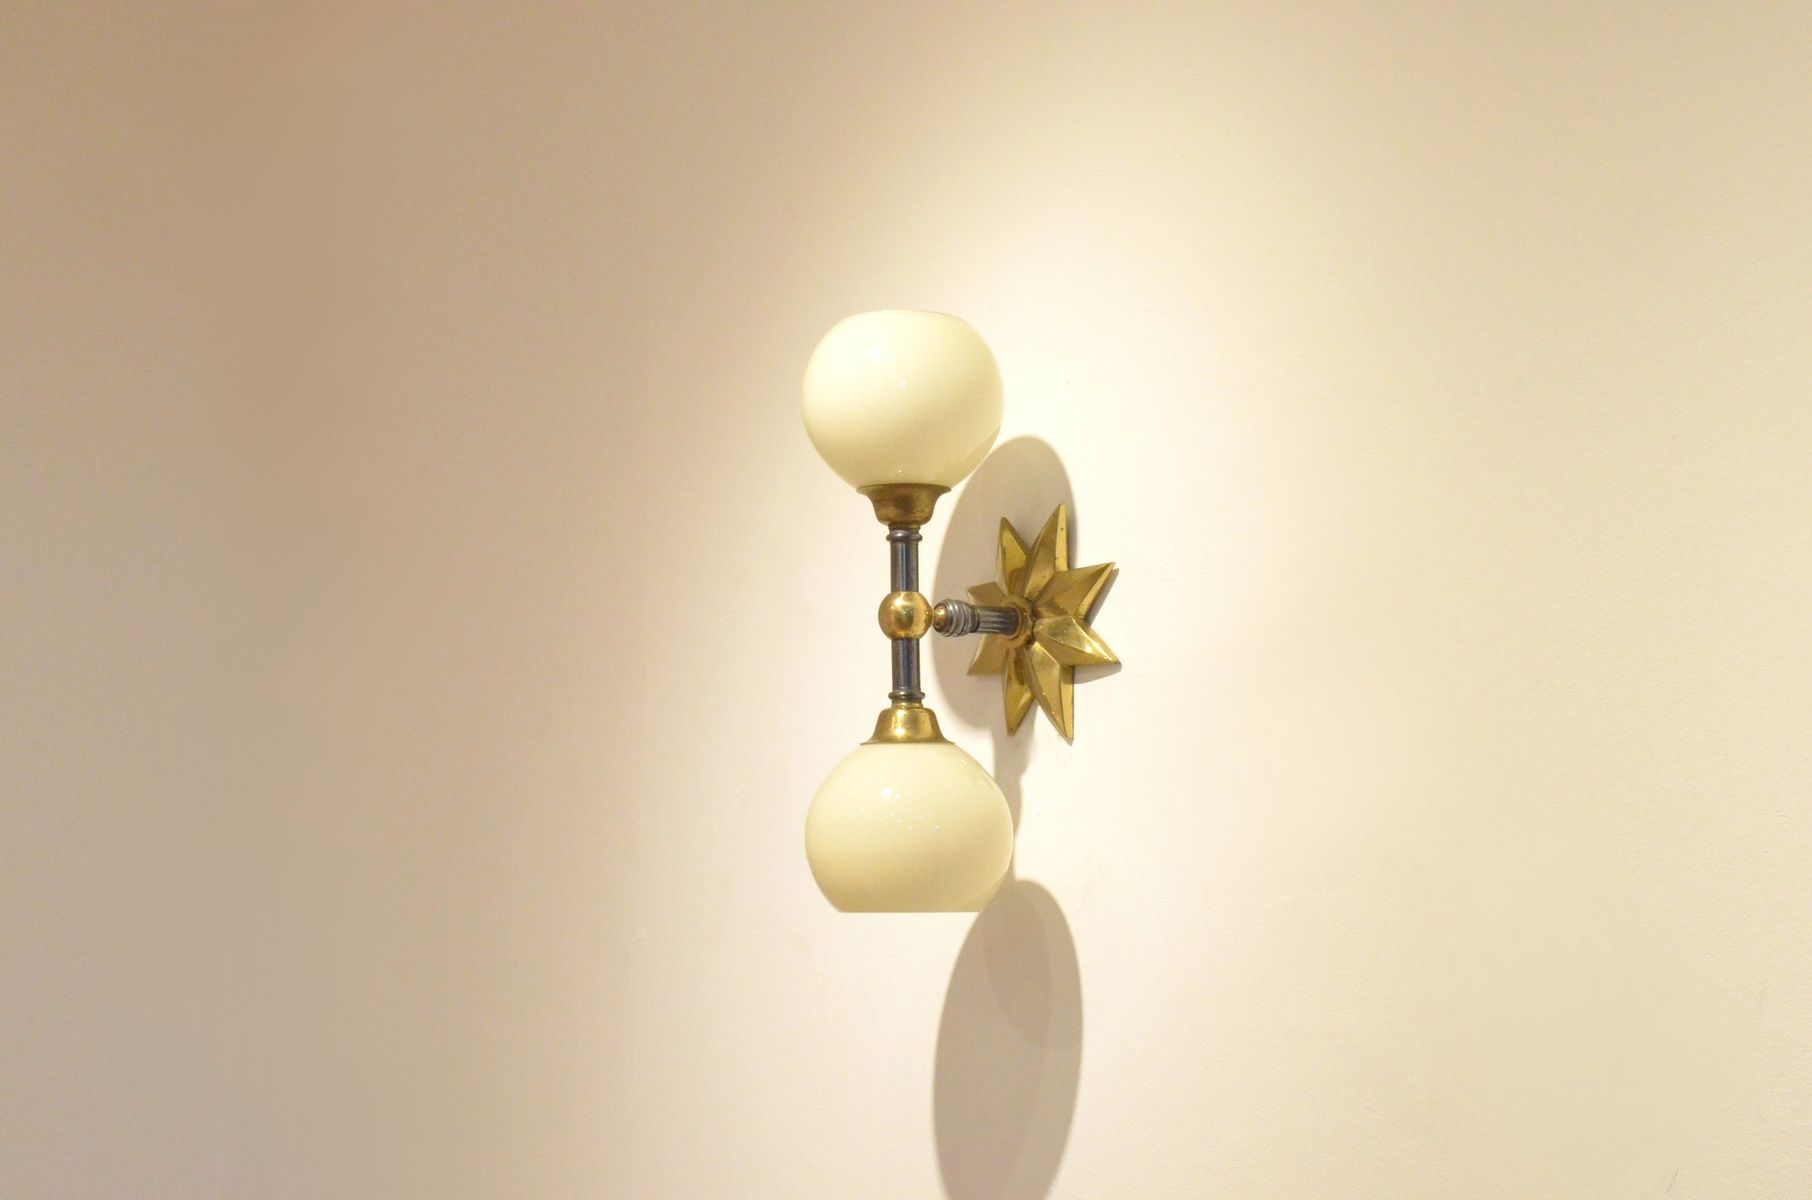 gro e franz sische mid century messing glas stern wandlampe bei pamono kaufen. Black Bedroom Furniture Sets. Home Design Ideas